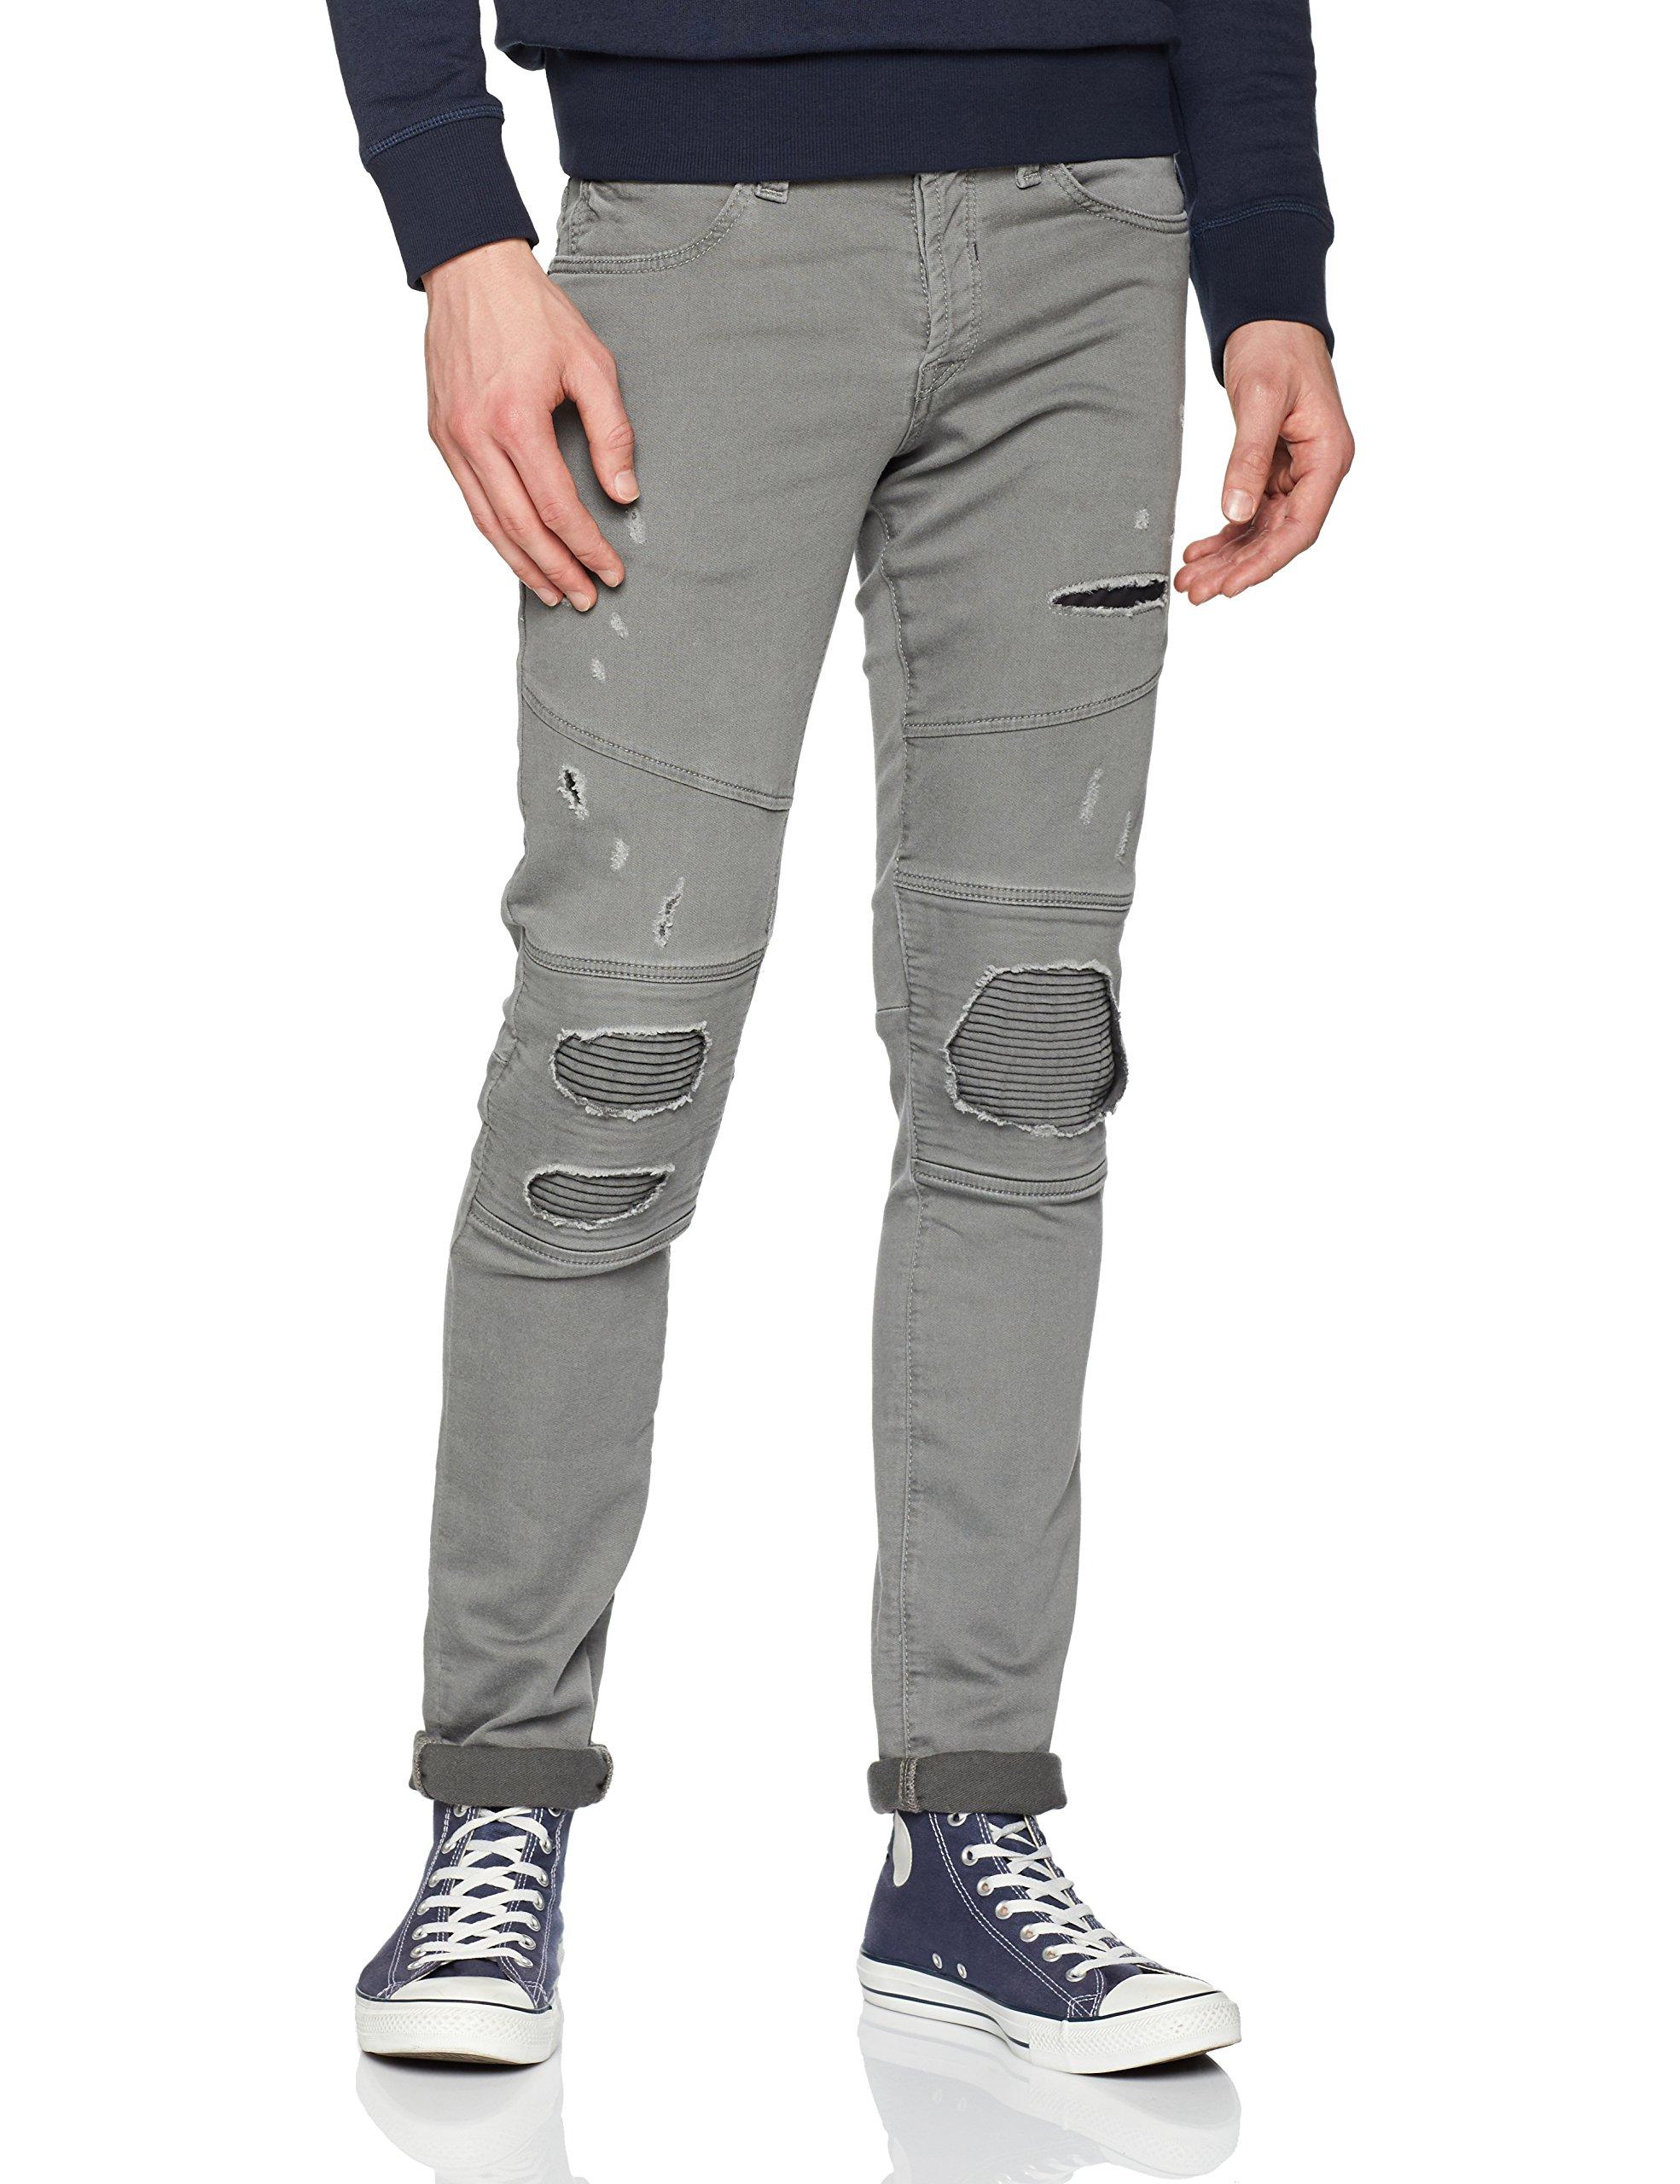 Dark Grey Jjiglenn Noos Jones Jjjaxx Jackamp; PantalonGristaille Biker Fabricant30Homme Jj 0wnP8OXk